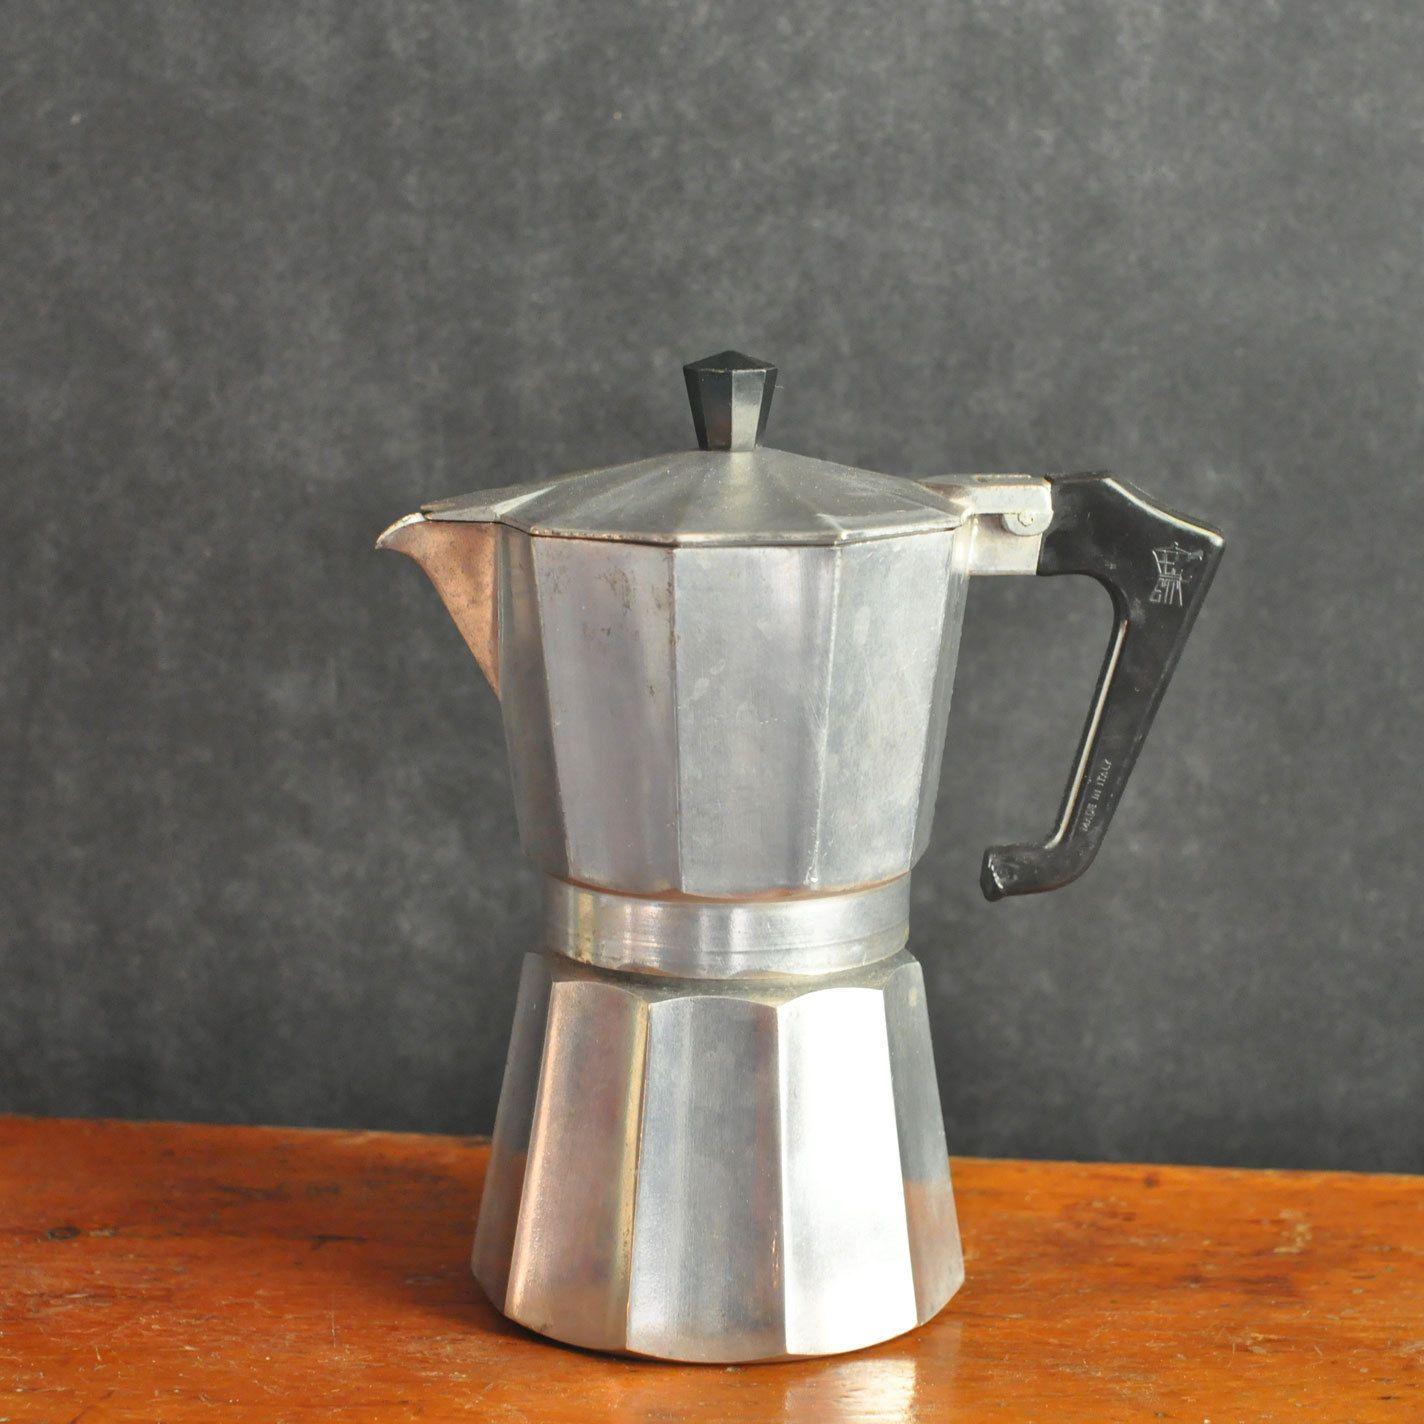 Vintage Italian Stovetop Coffee Espresso Maker Pezzeti